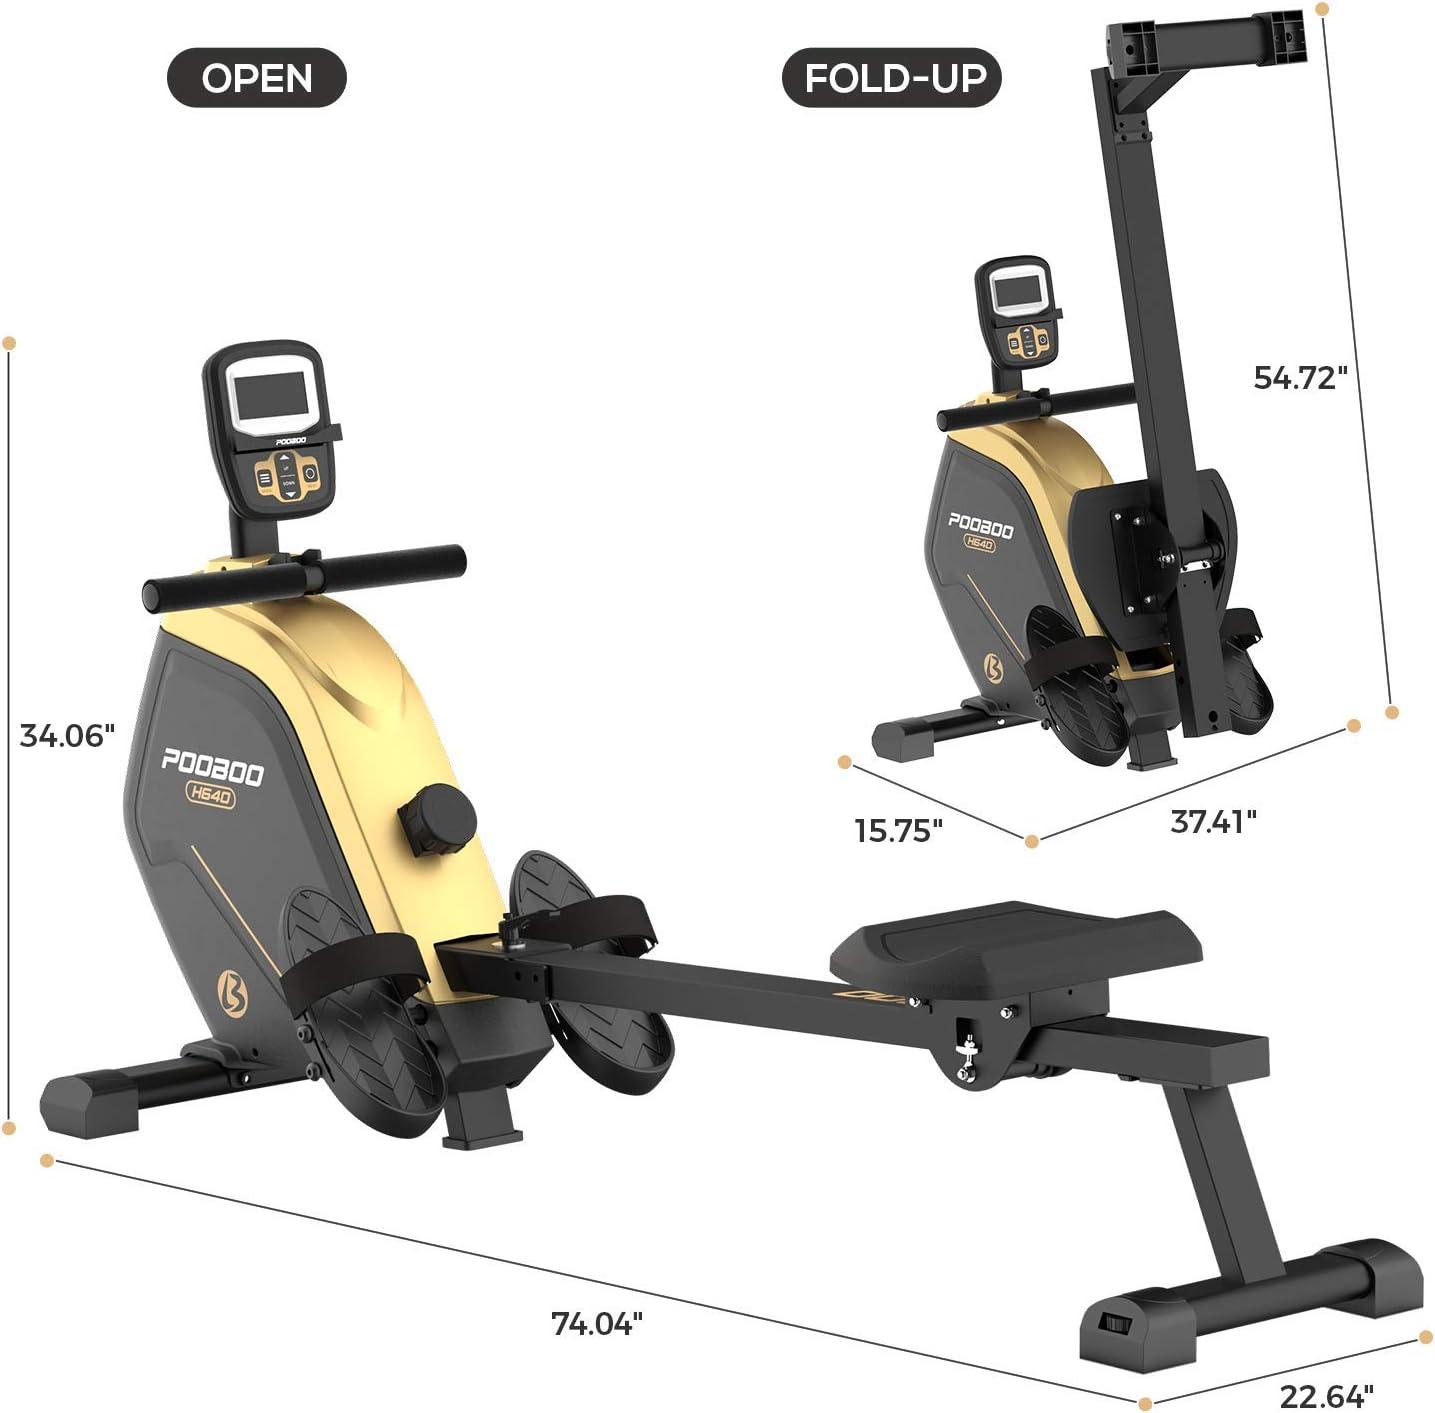 719VIsUBmtL. AC SL1500 Best Rowing Machines Under $500 in 2021